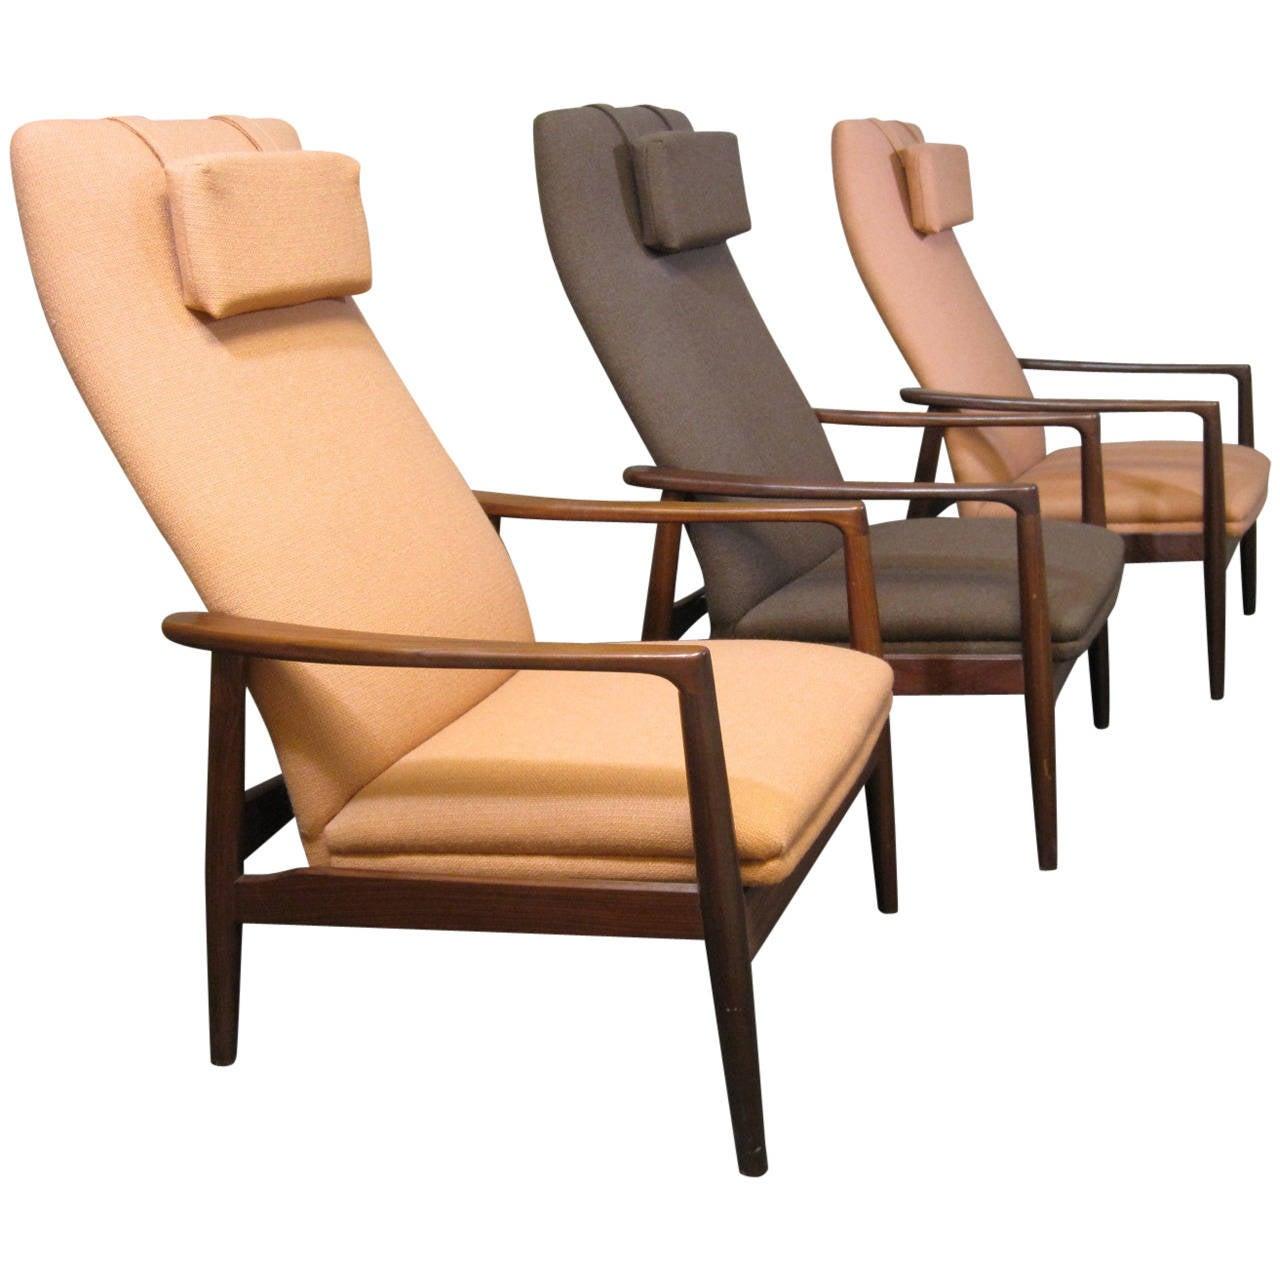 Scandinavian Teak Reclining Lounge Chairs at 1stdibs